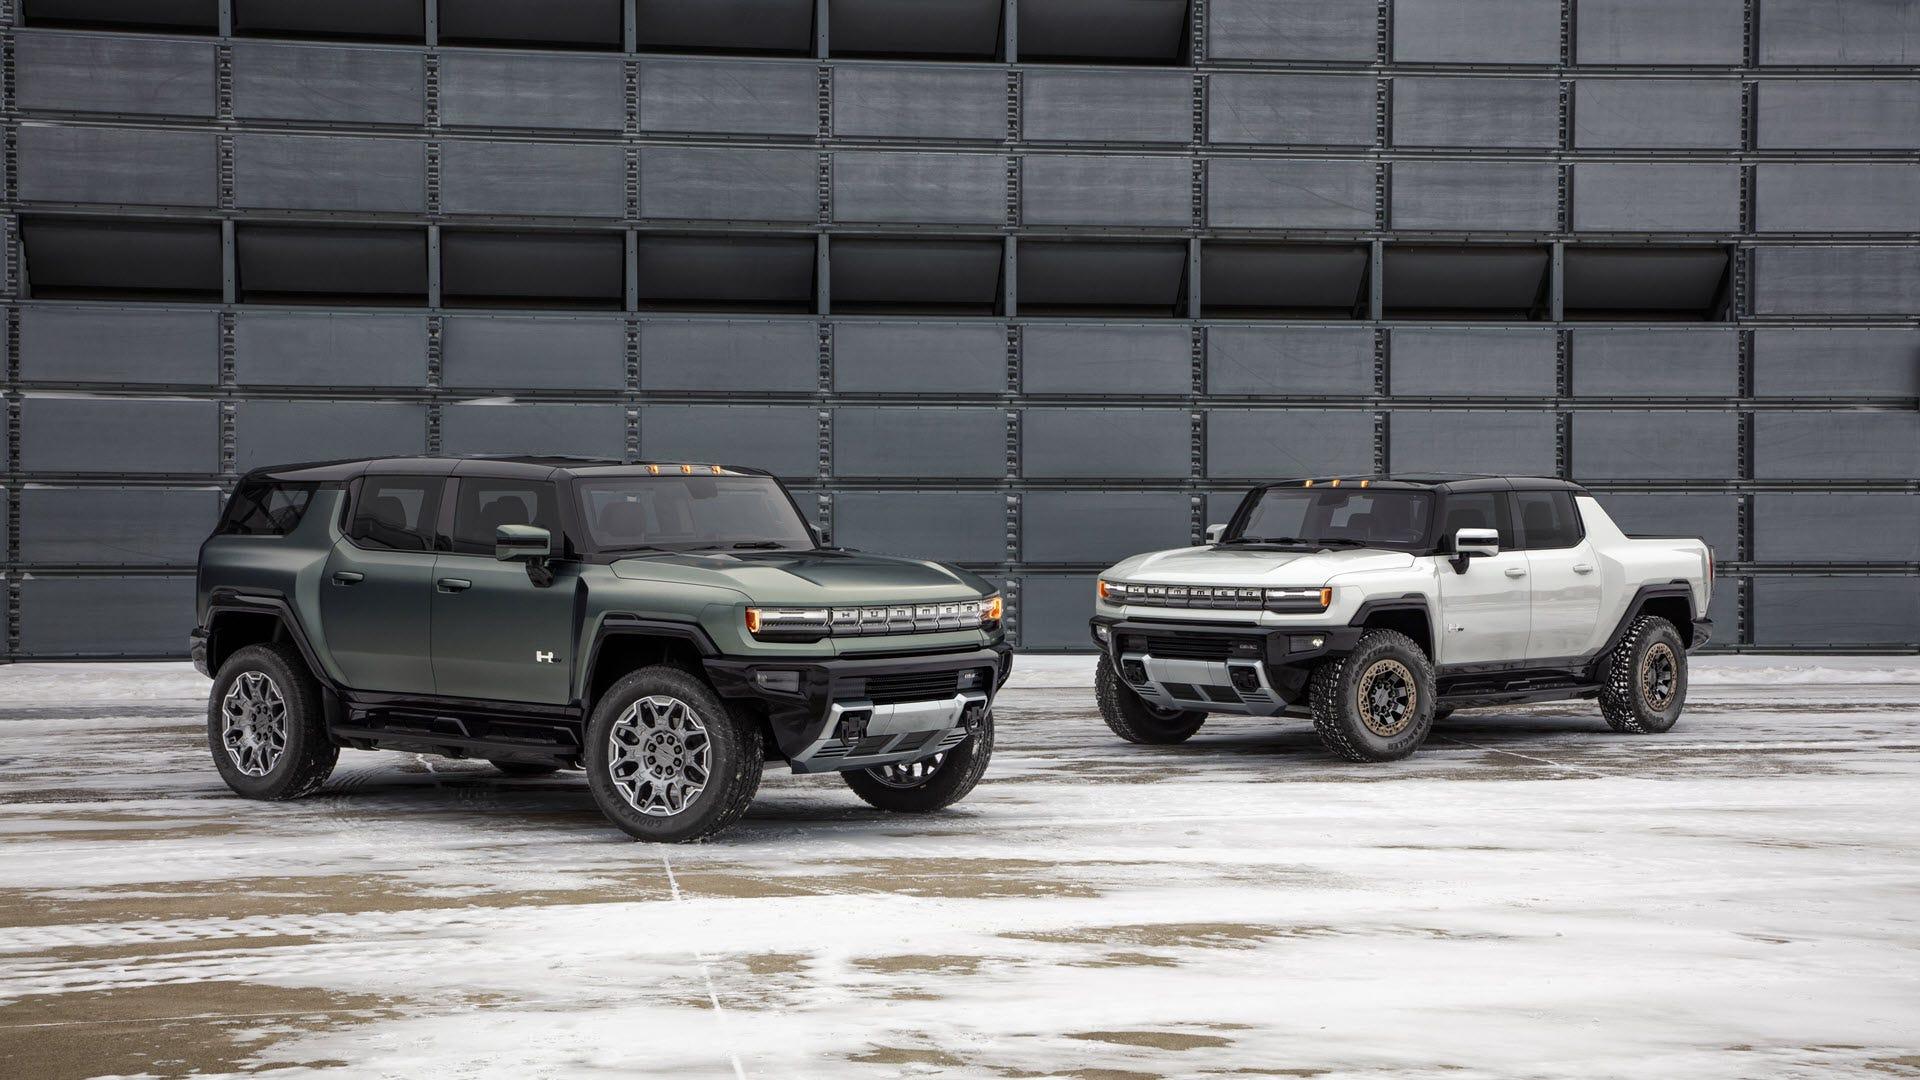 Hummer-SUV-EV-Smartphonegreece (4)